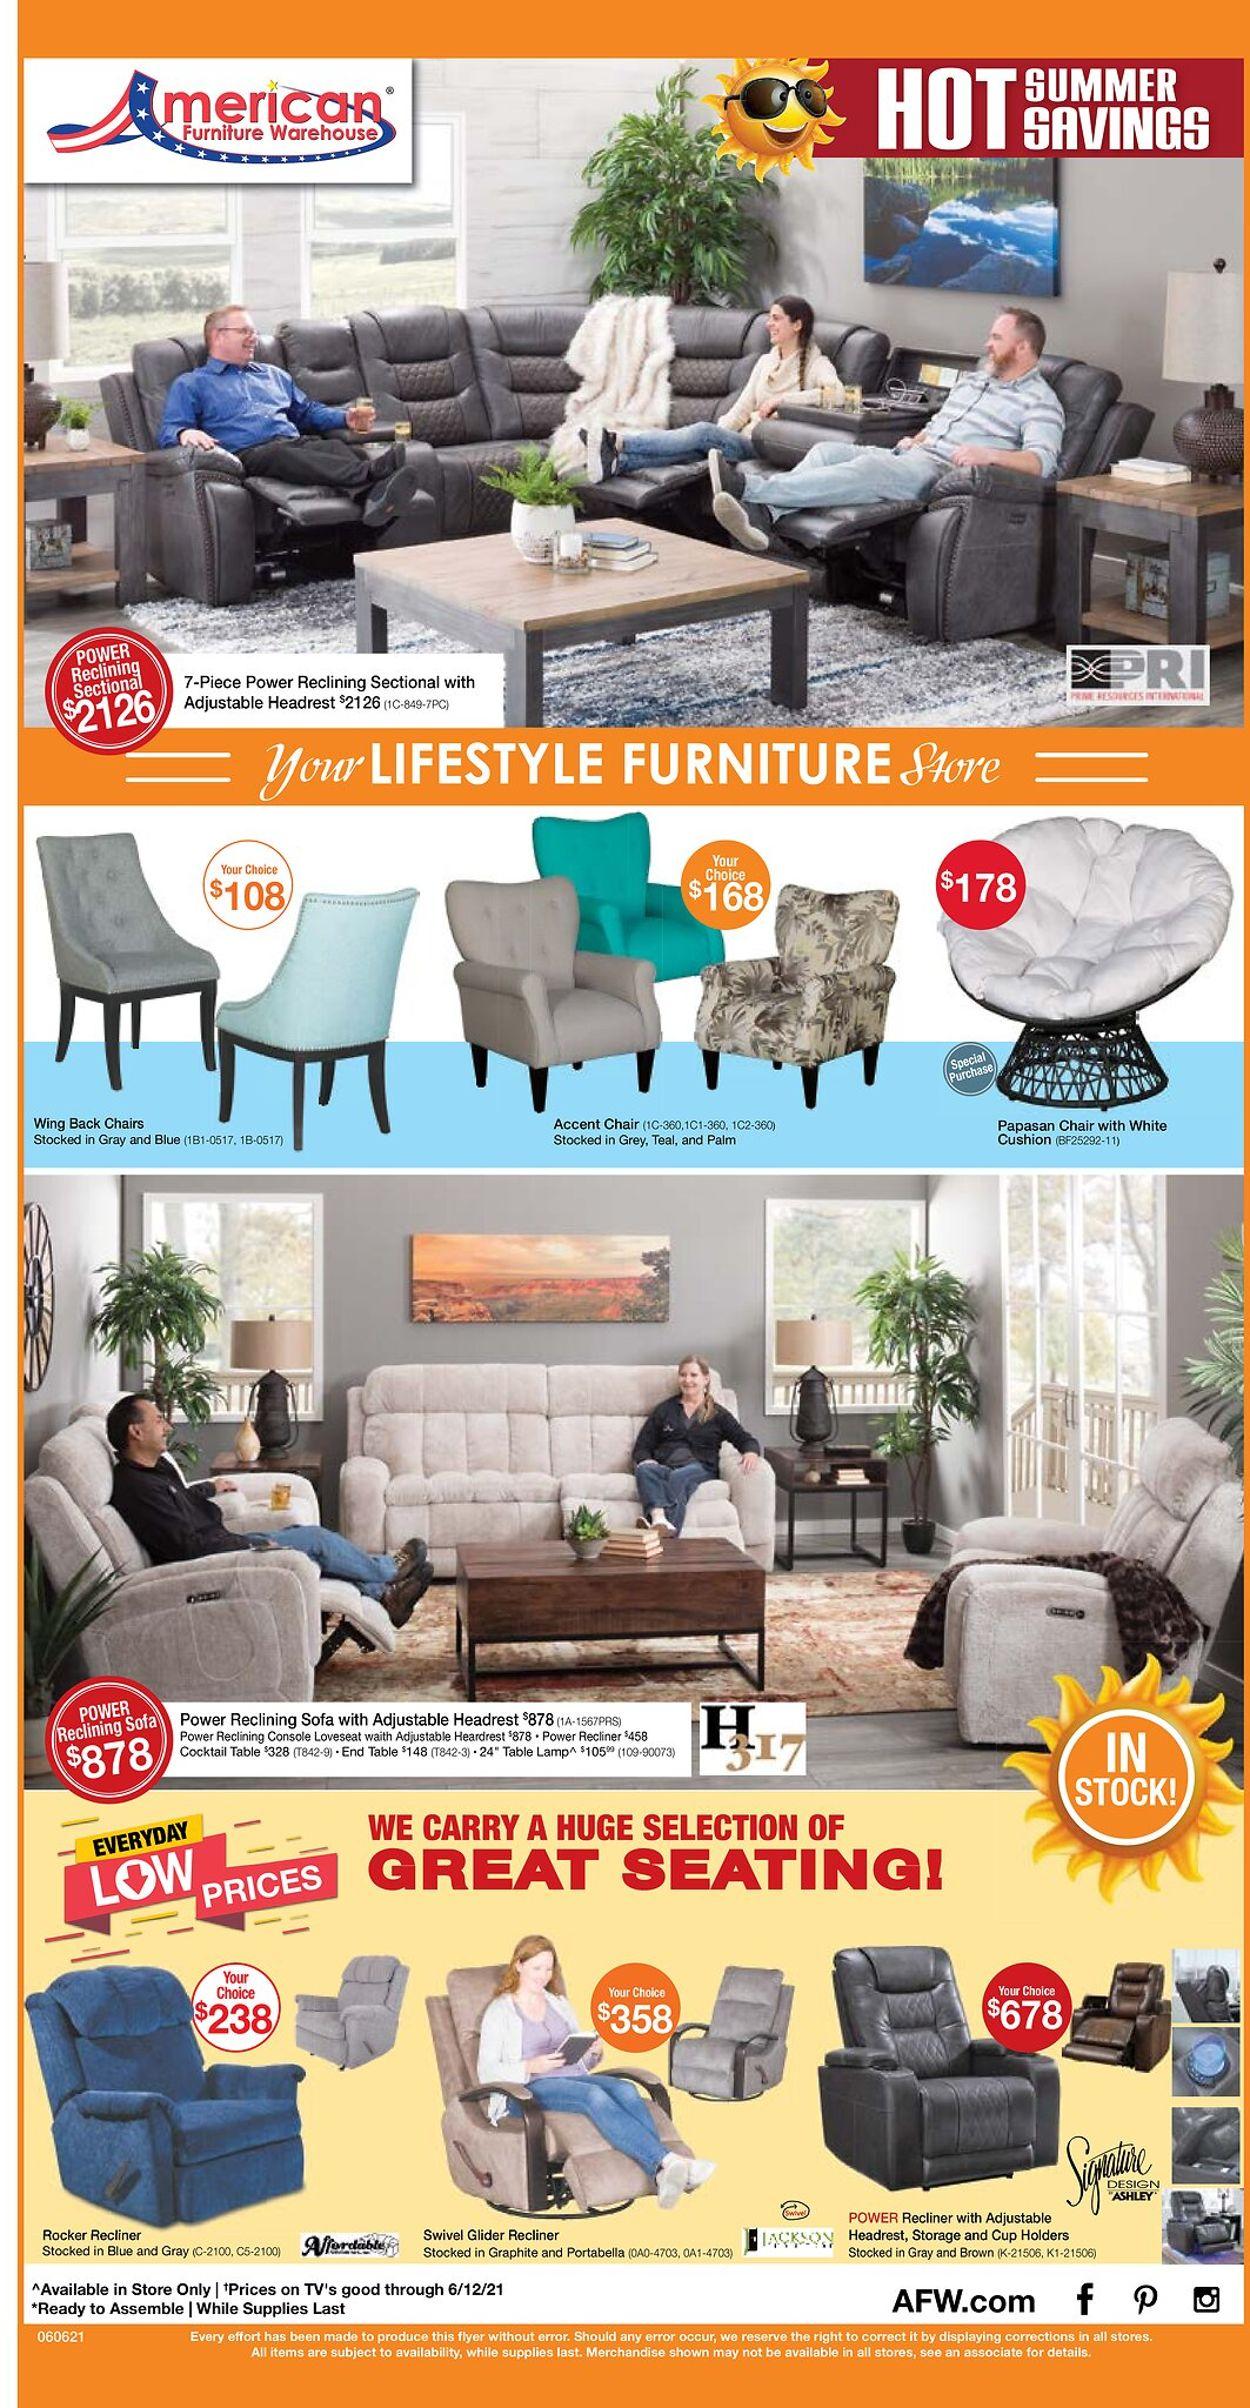 American Furniture Warehouse Weekly Ad Circular - valid 06/06-06/12/2021